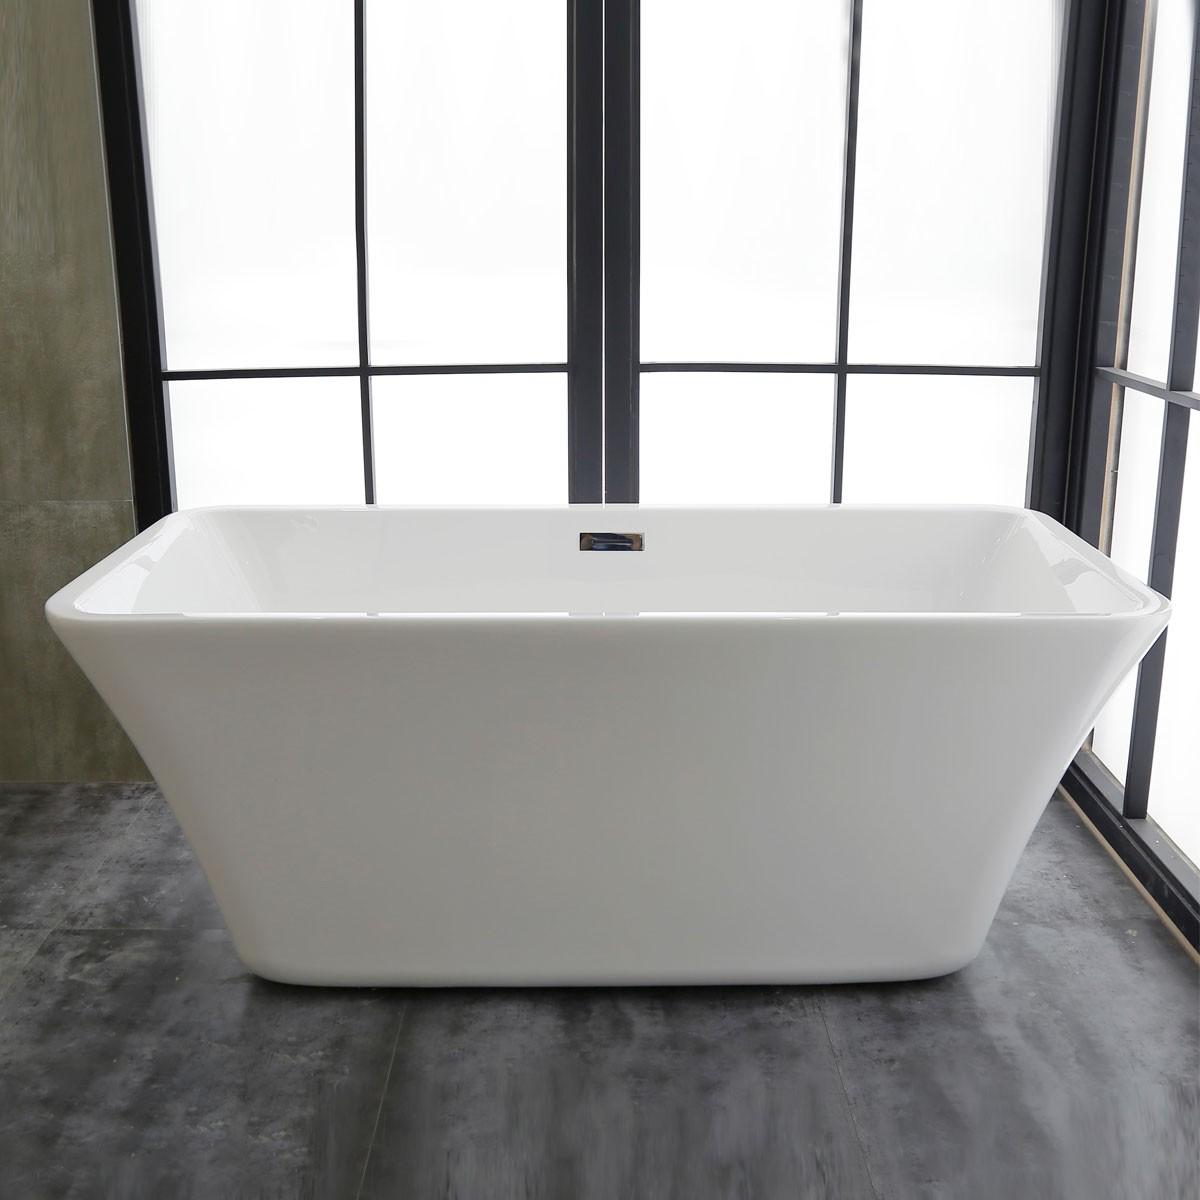 59 In Freestanding Bathtub - Acrylic Pure White (DK-PW-K56570)